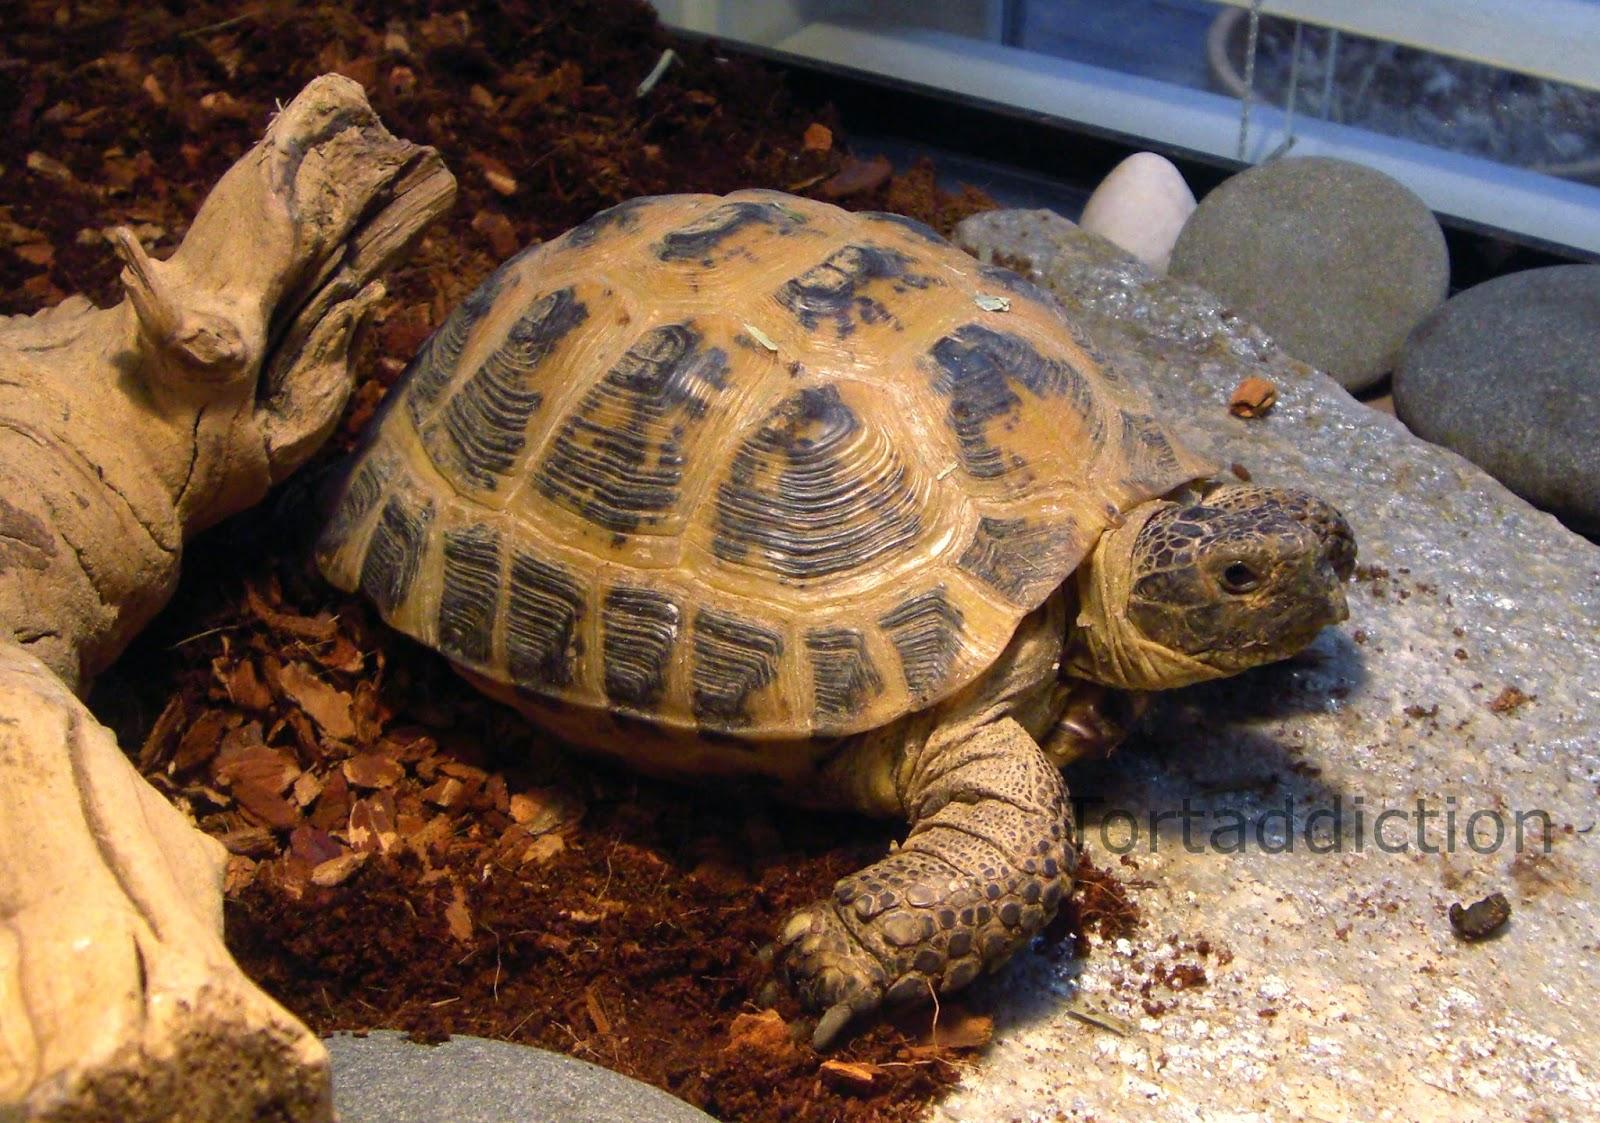 От чего умирают черепахи в домашних условиях